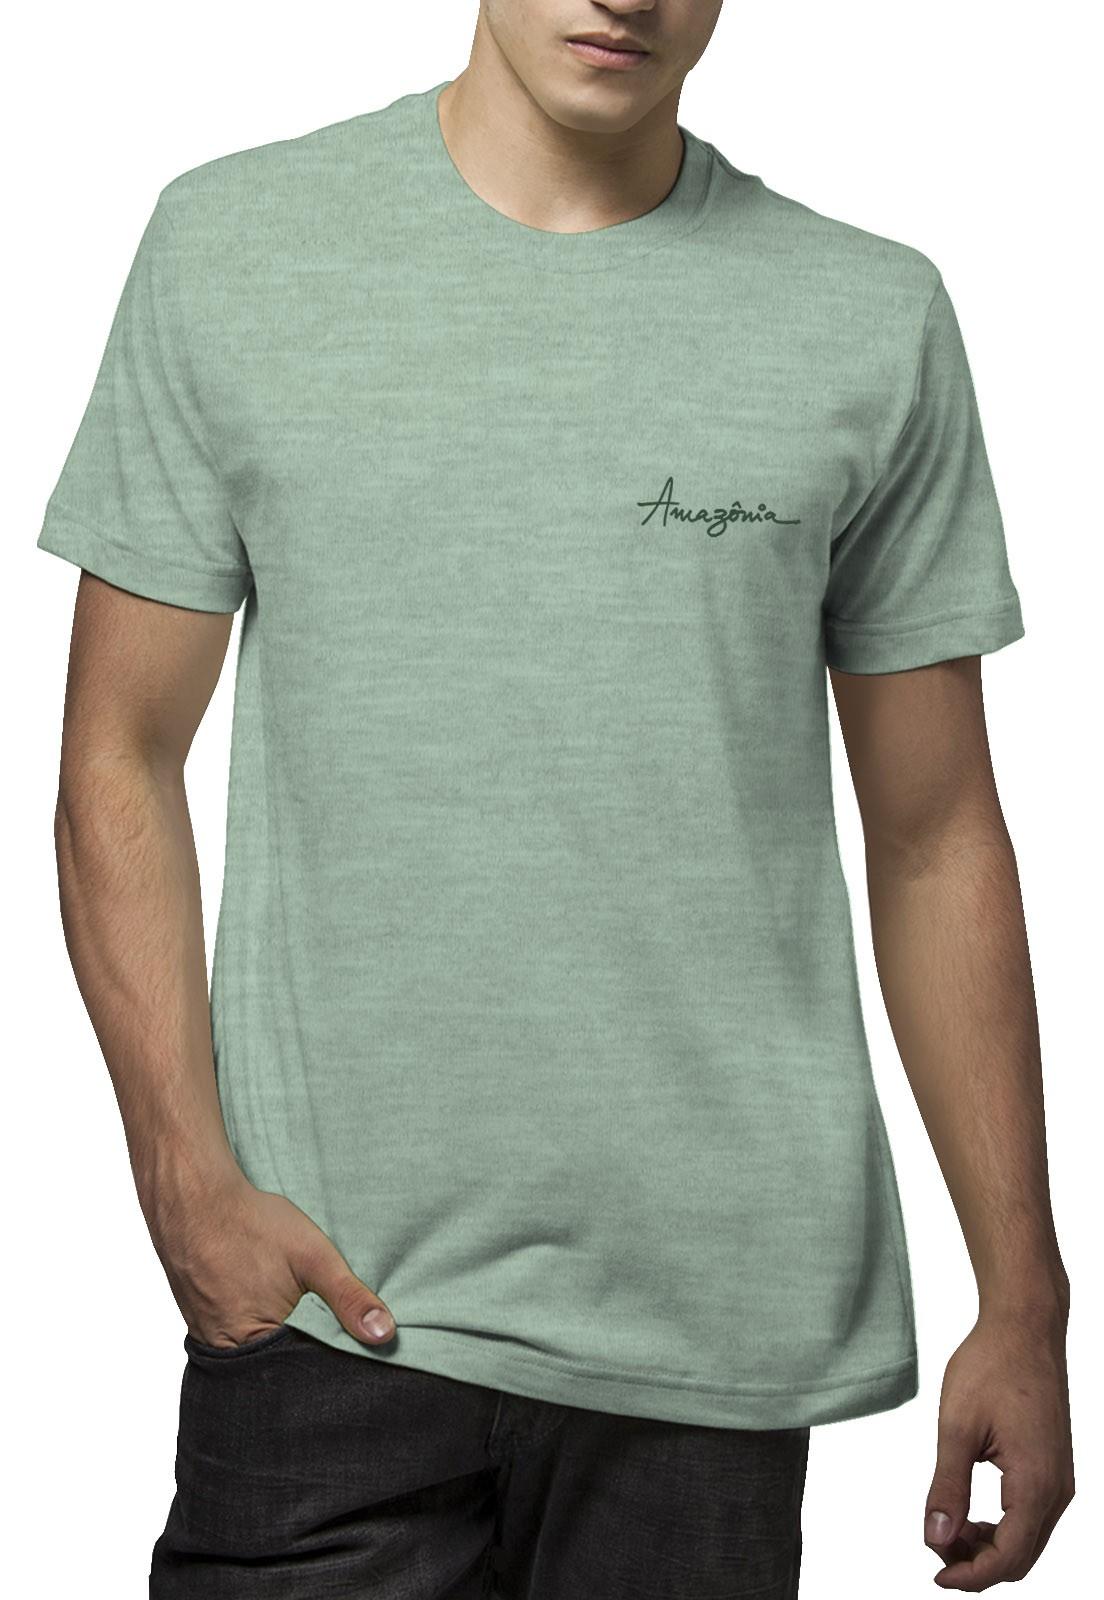 Camiseta Amazônia Bird Tree - Verde Mescla